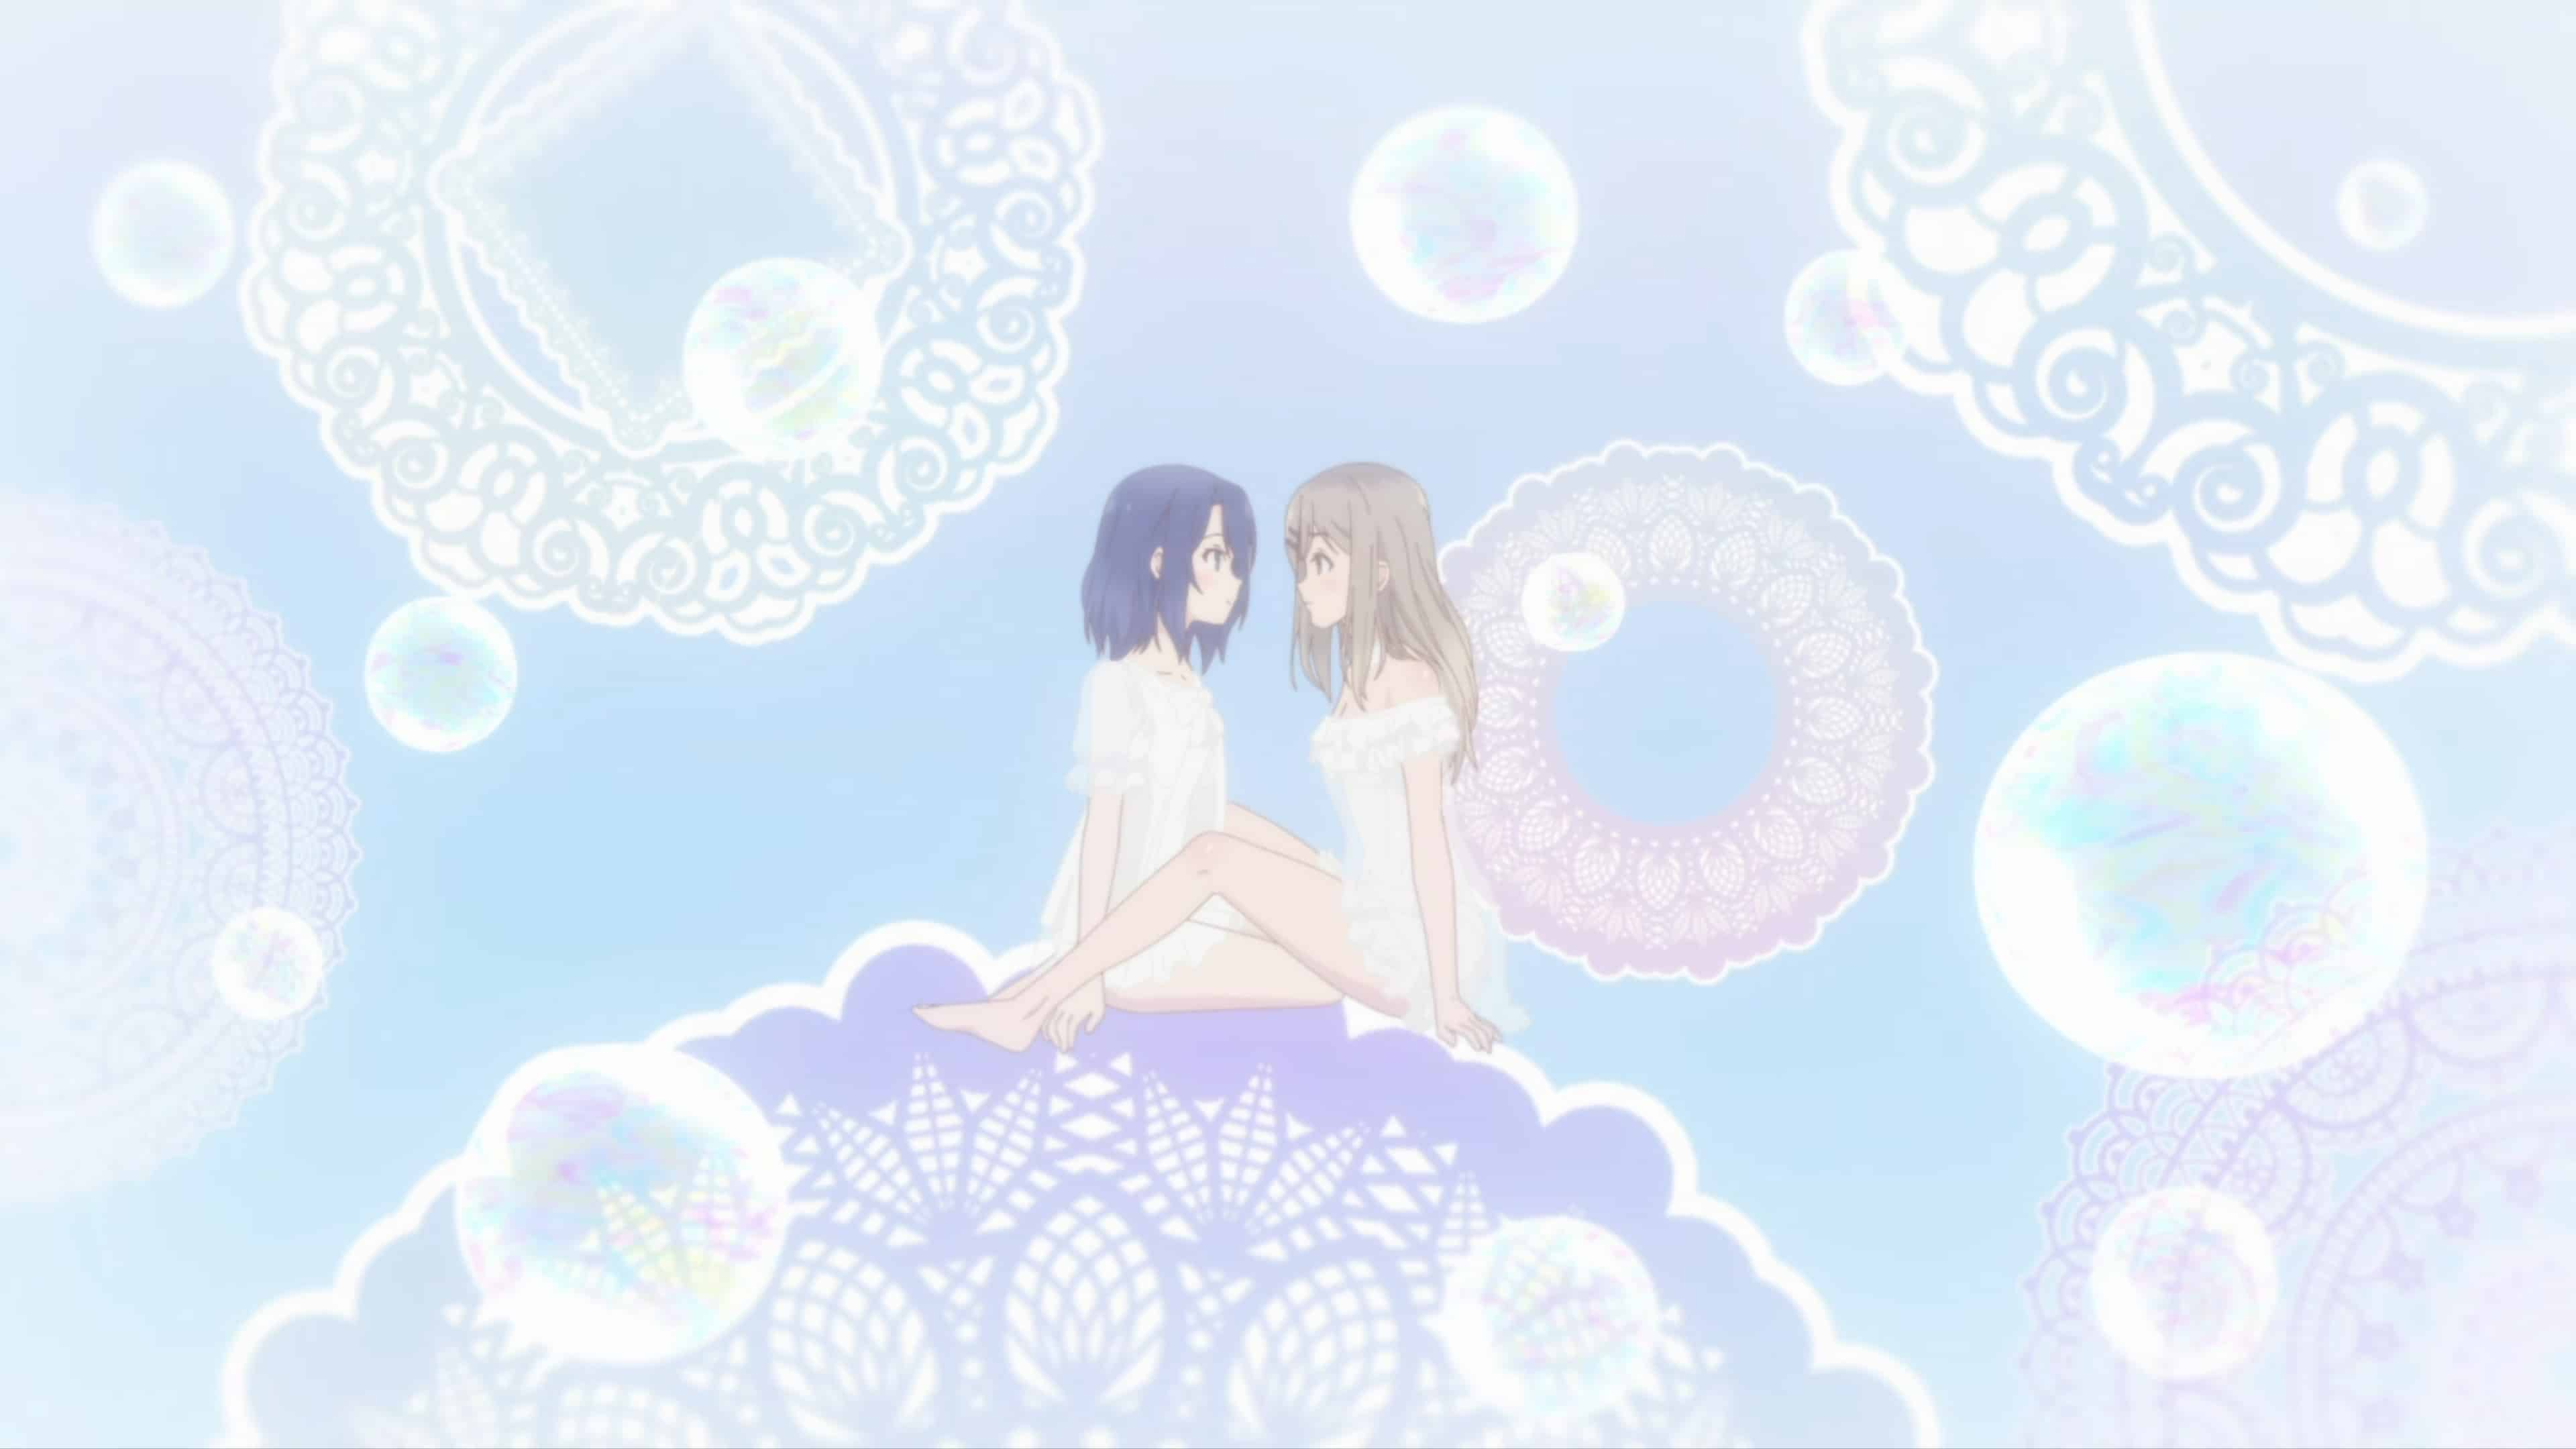 Adachi and Shimamura in a dream sequence